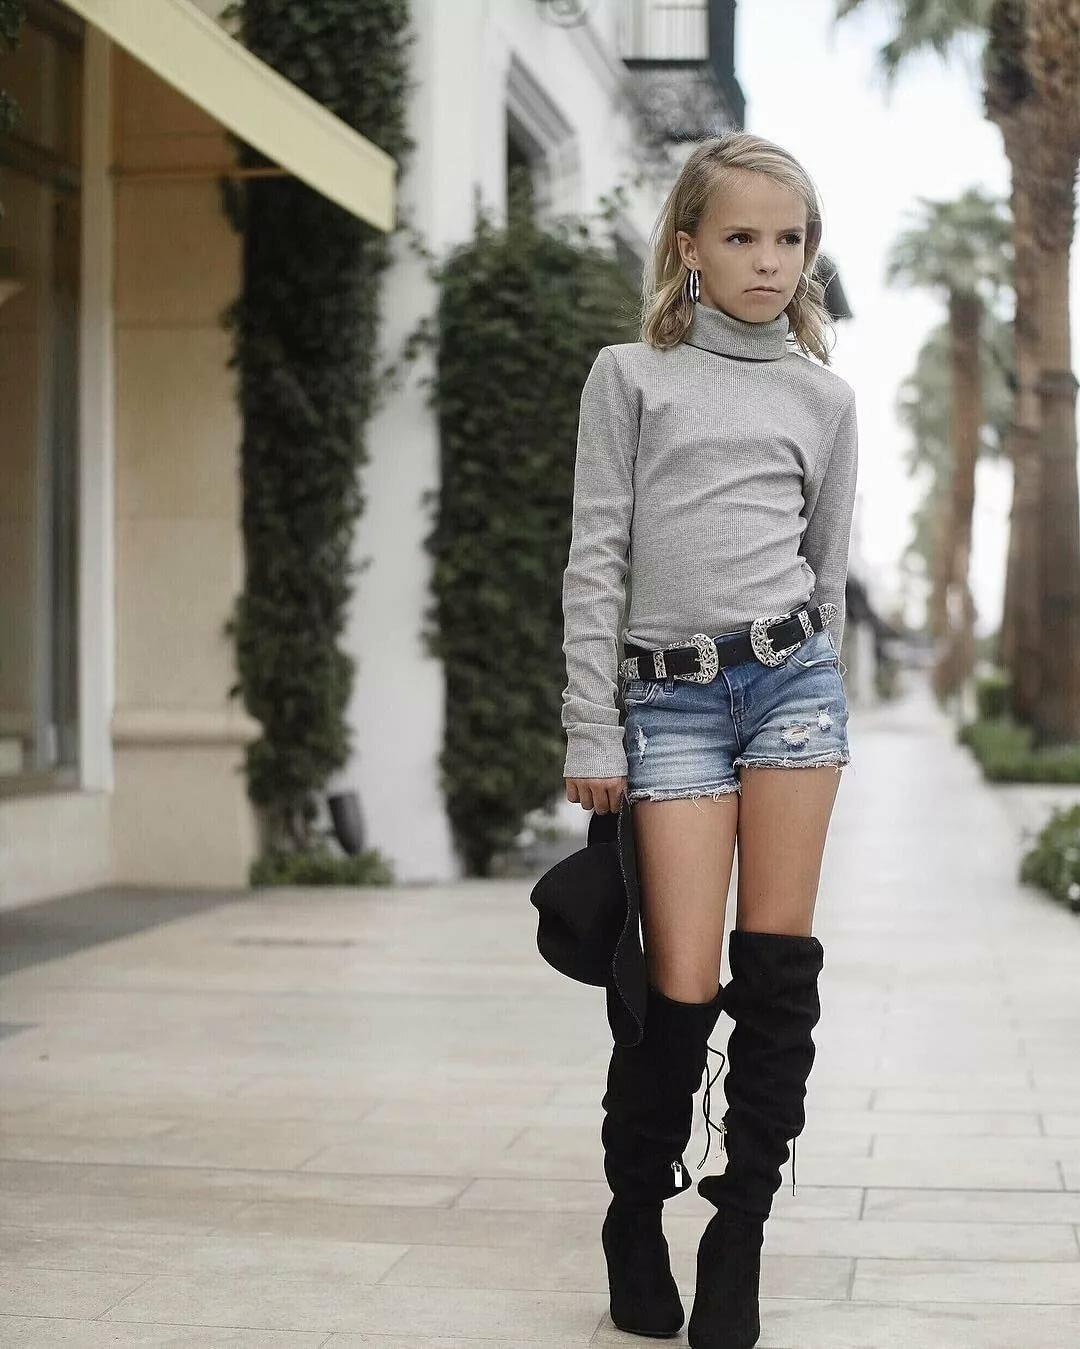 Teen fashion blog the